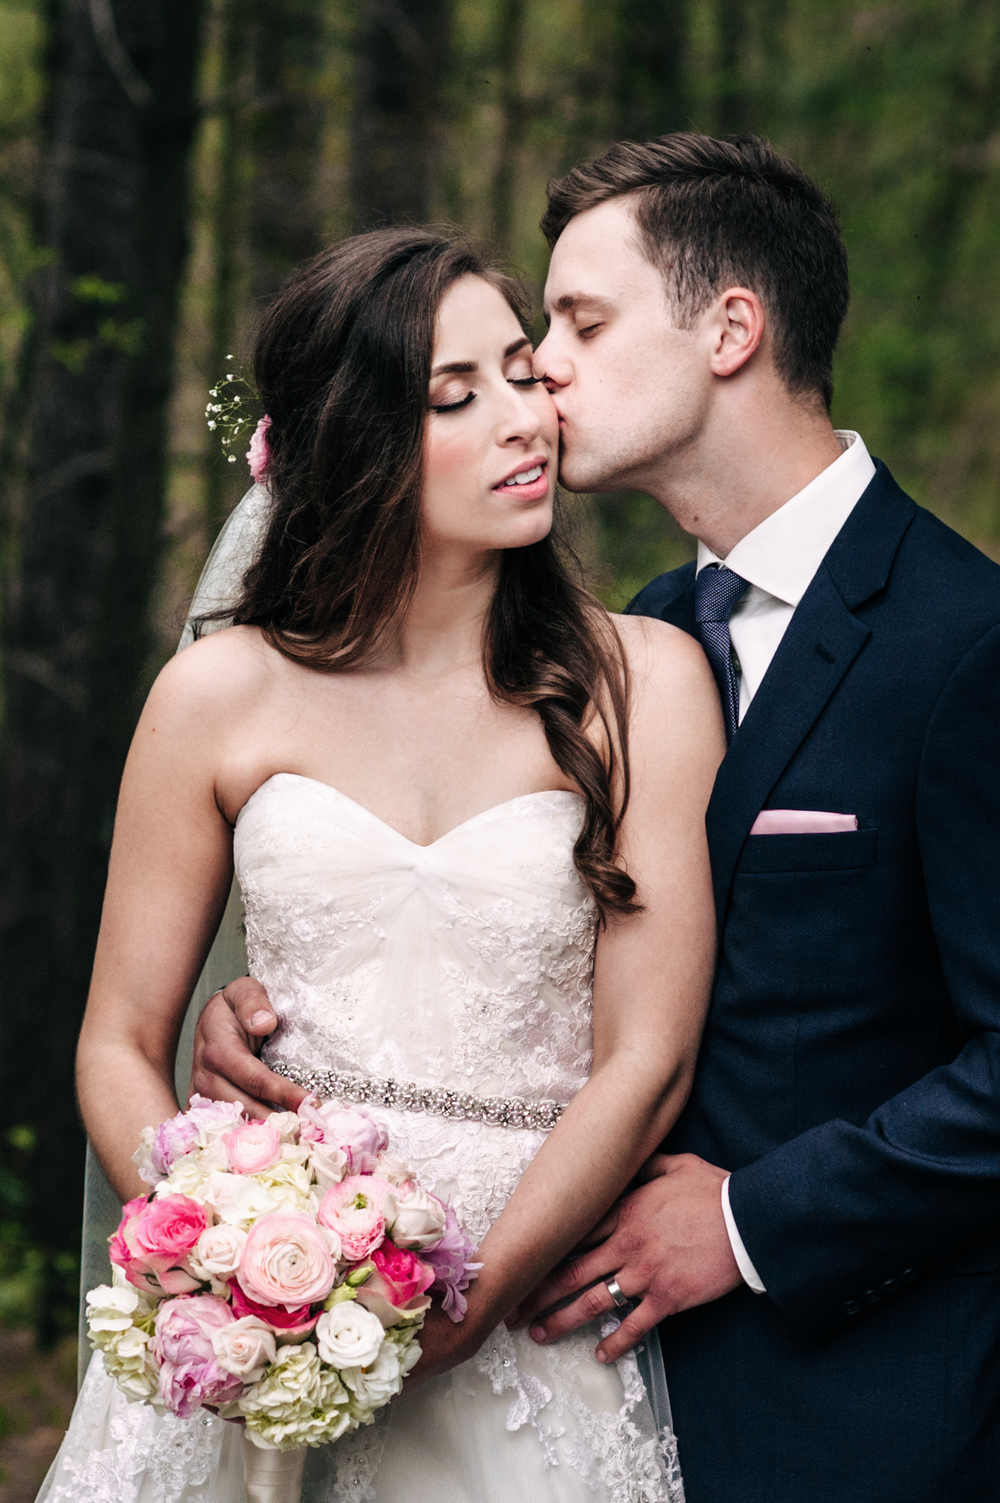 http://www.everylittlewonder.com/chris-and-jessicas-wedding/